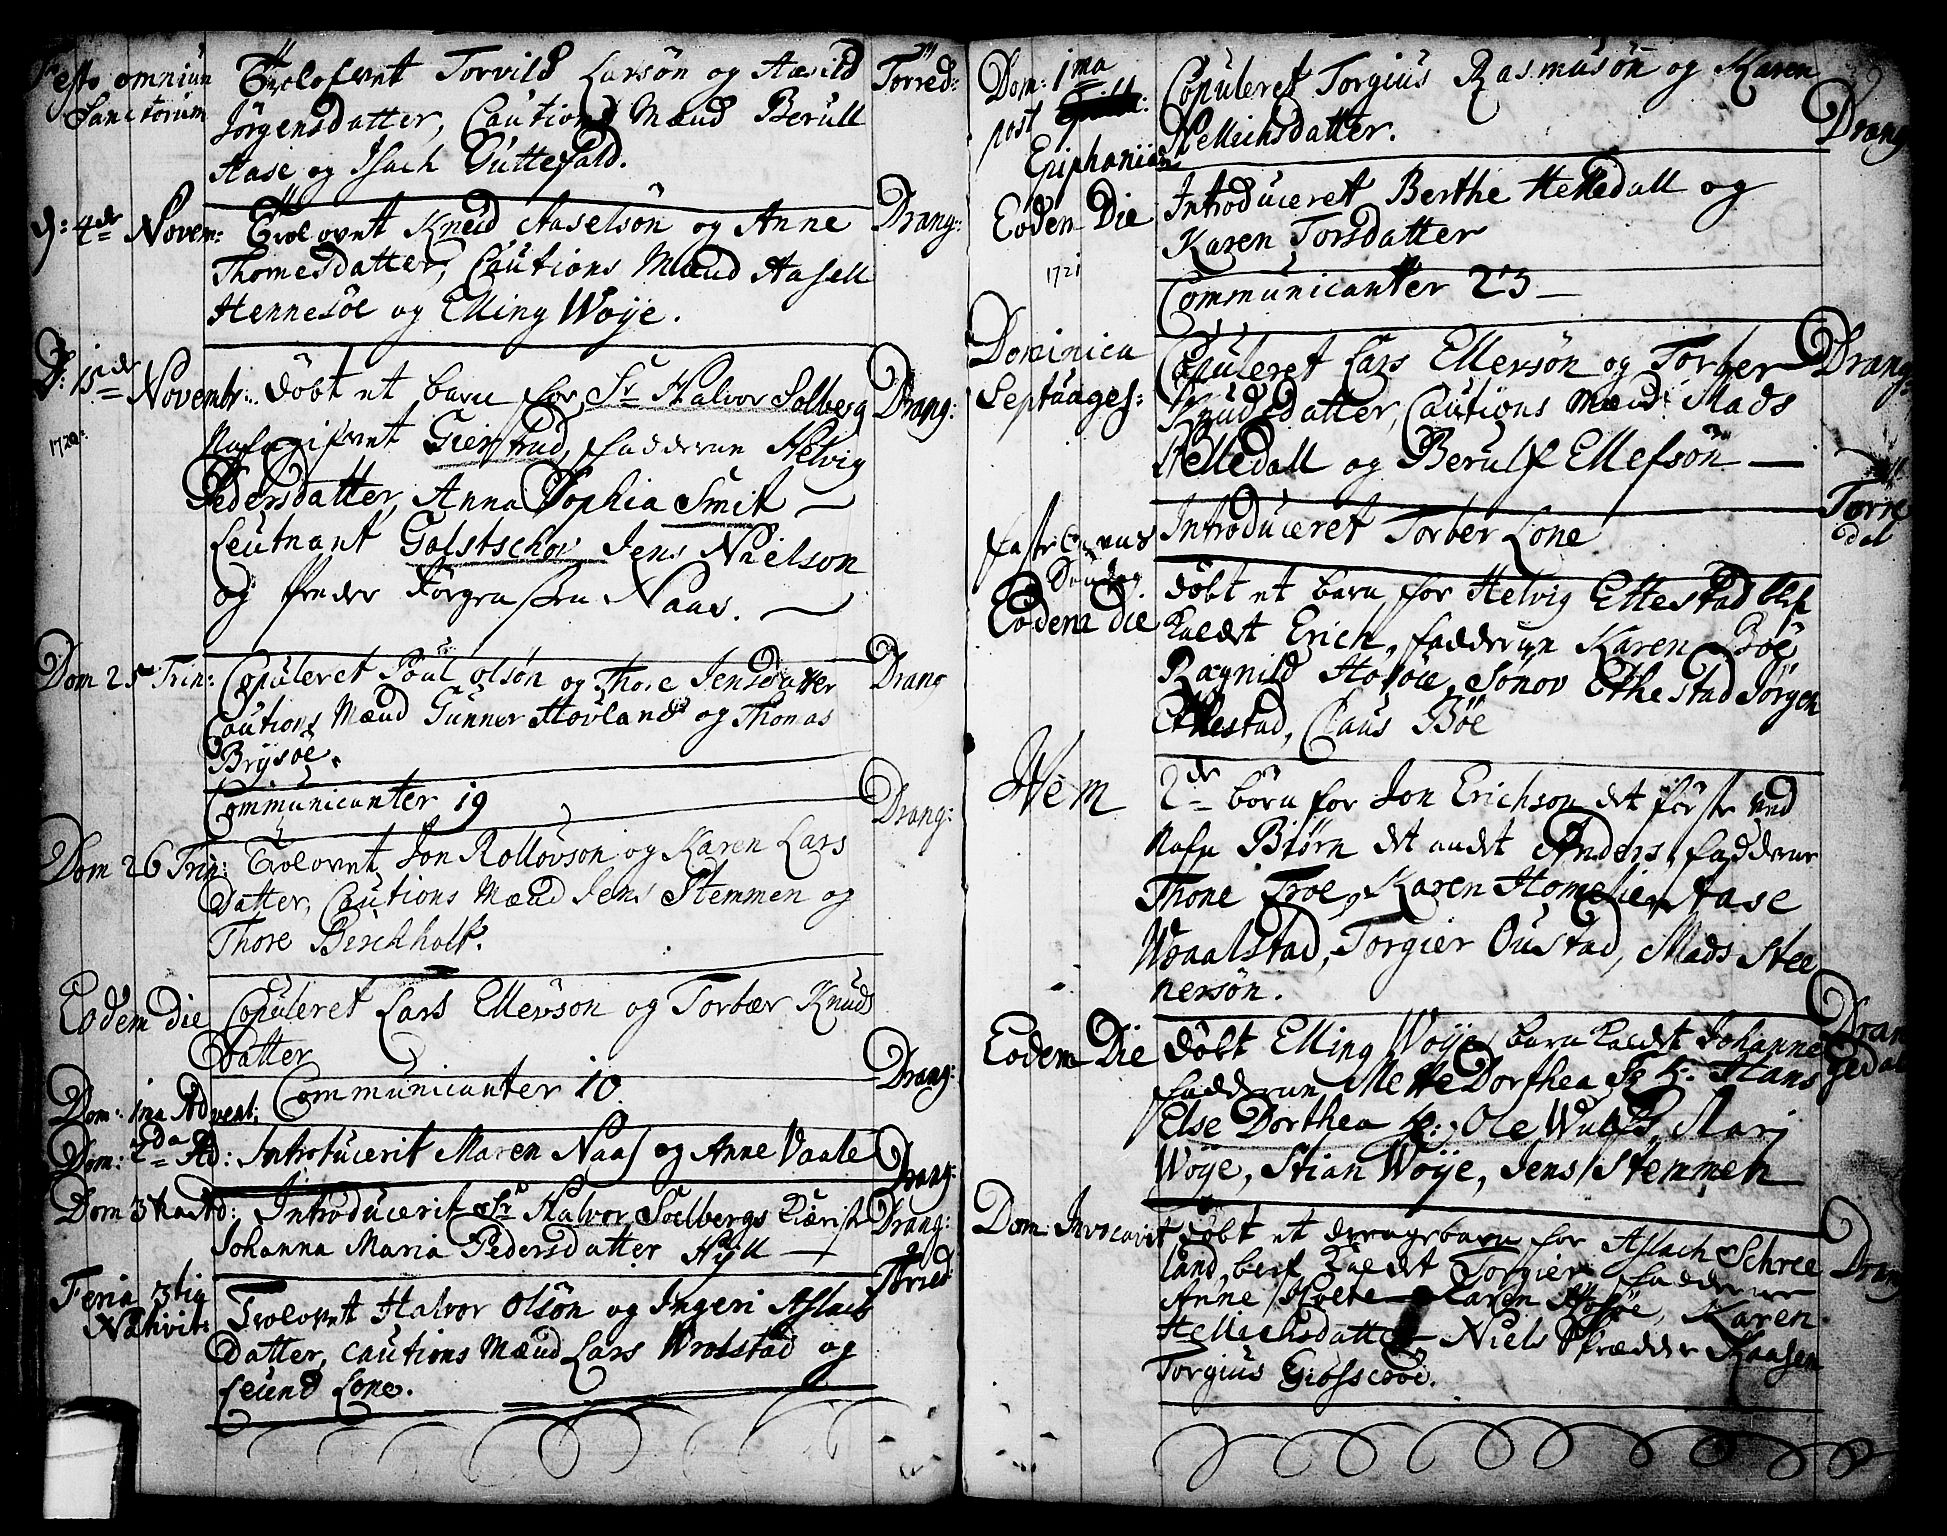 SAKO, Drangedal kirkebøker, F/Fa/L0001: Ministerialbok nr. 1, 1697-1767, s. 39